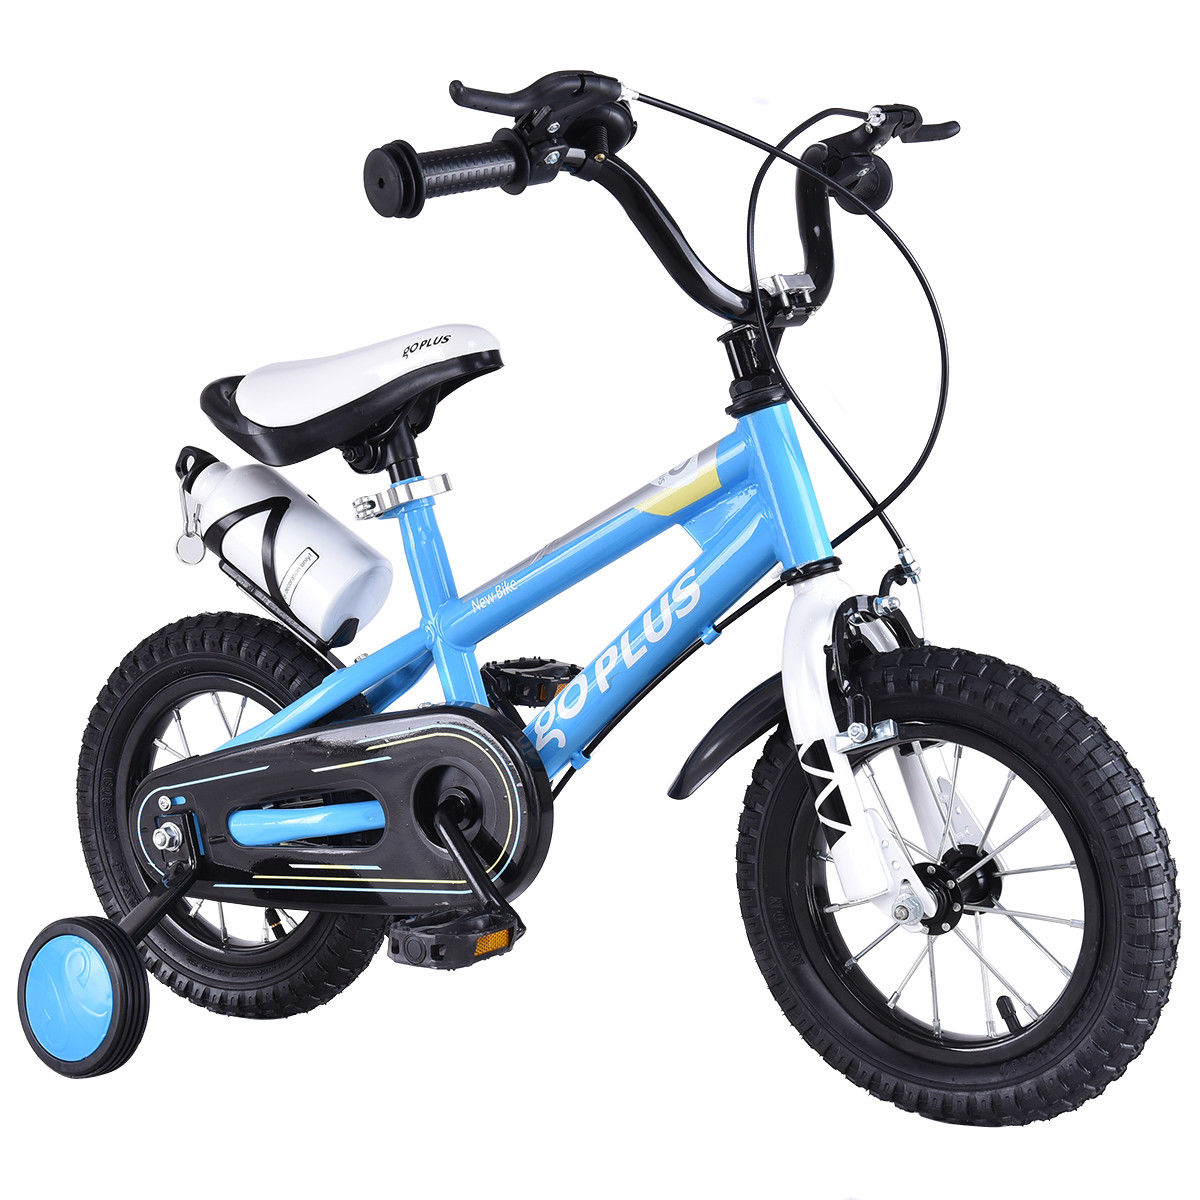 e4cfa92350d Goplus 16'' Freestyle Kids Bike Bicycle Children Boys & Girls w Training  Wheels Blue - Walmart.com